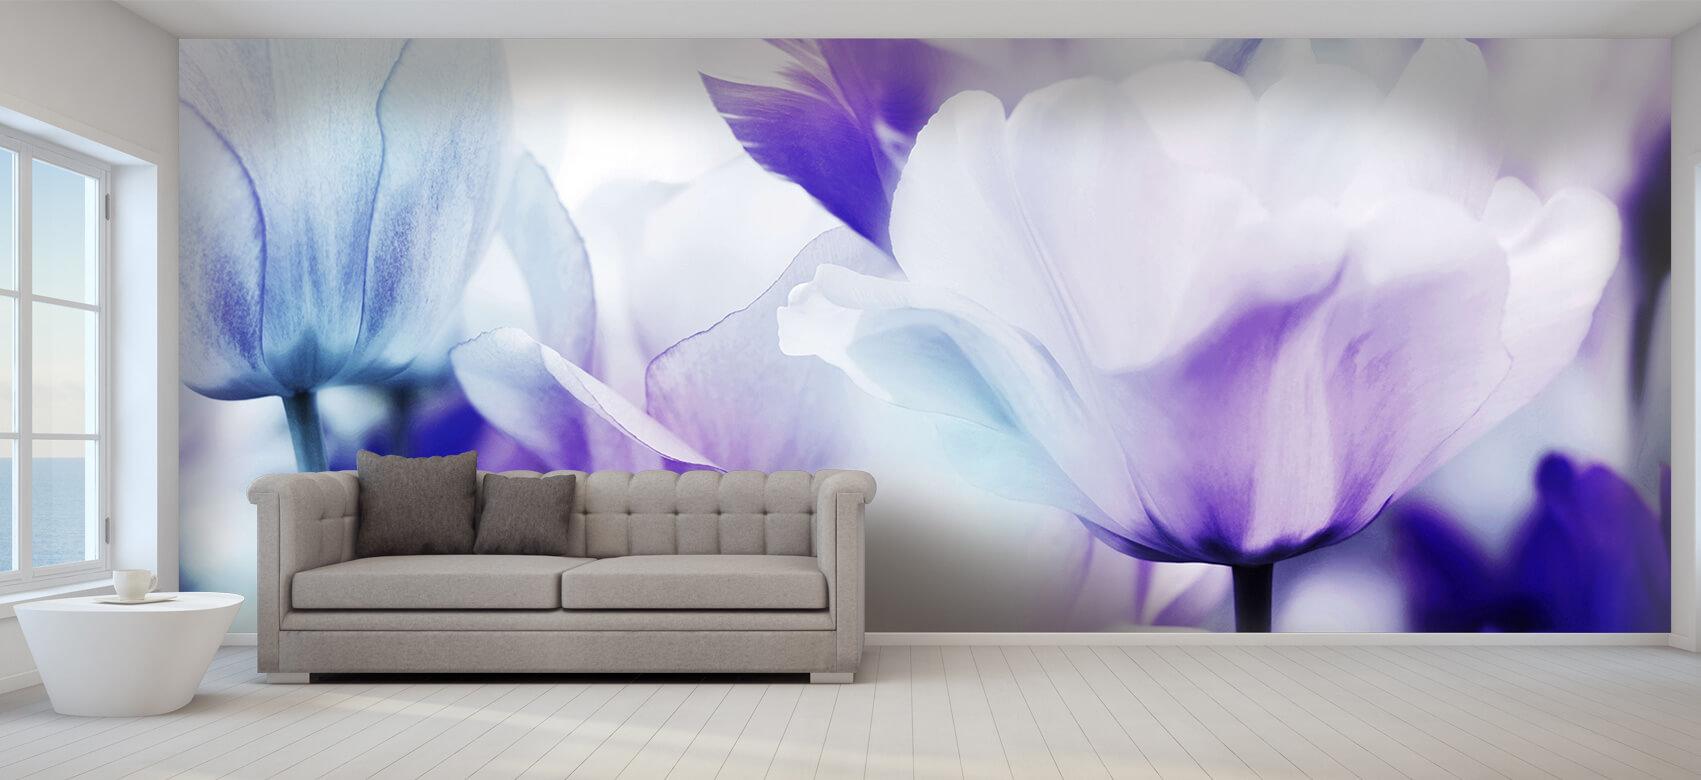 Bloemen, planten en bomen Tulpen fantasie 8